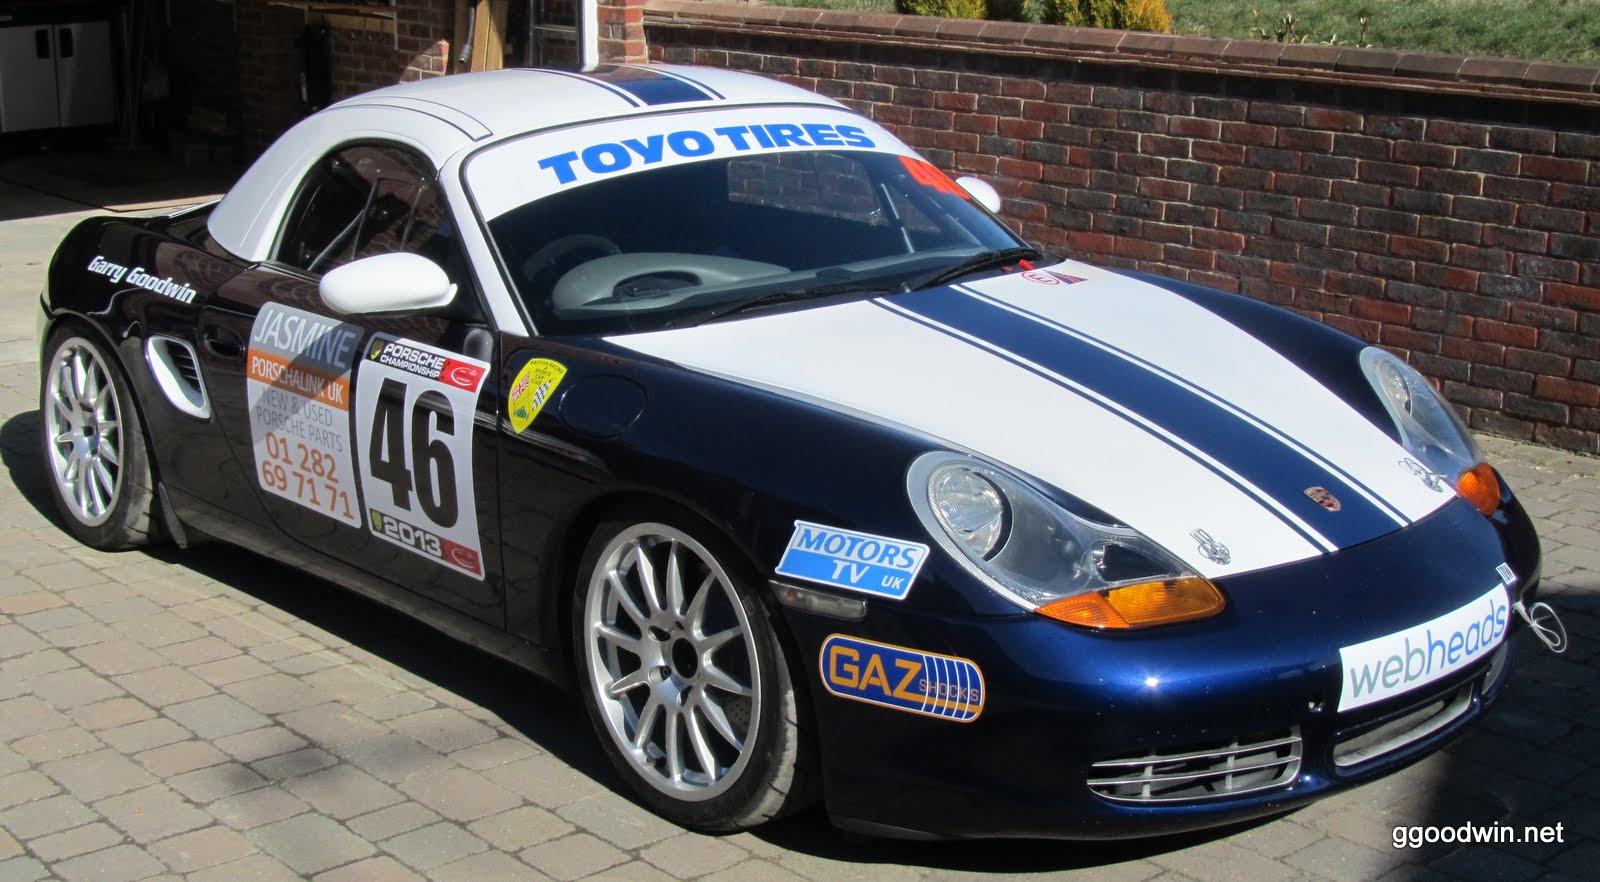 Porsche Boxster Track / Race Car: A new look for the 2013 Season